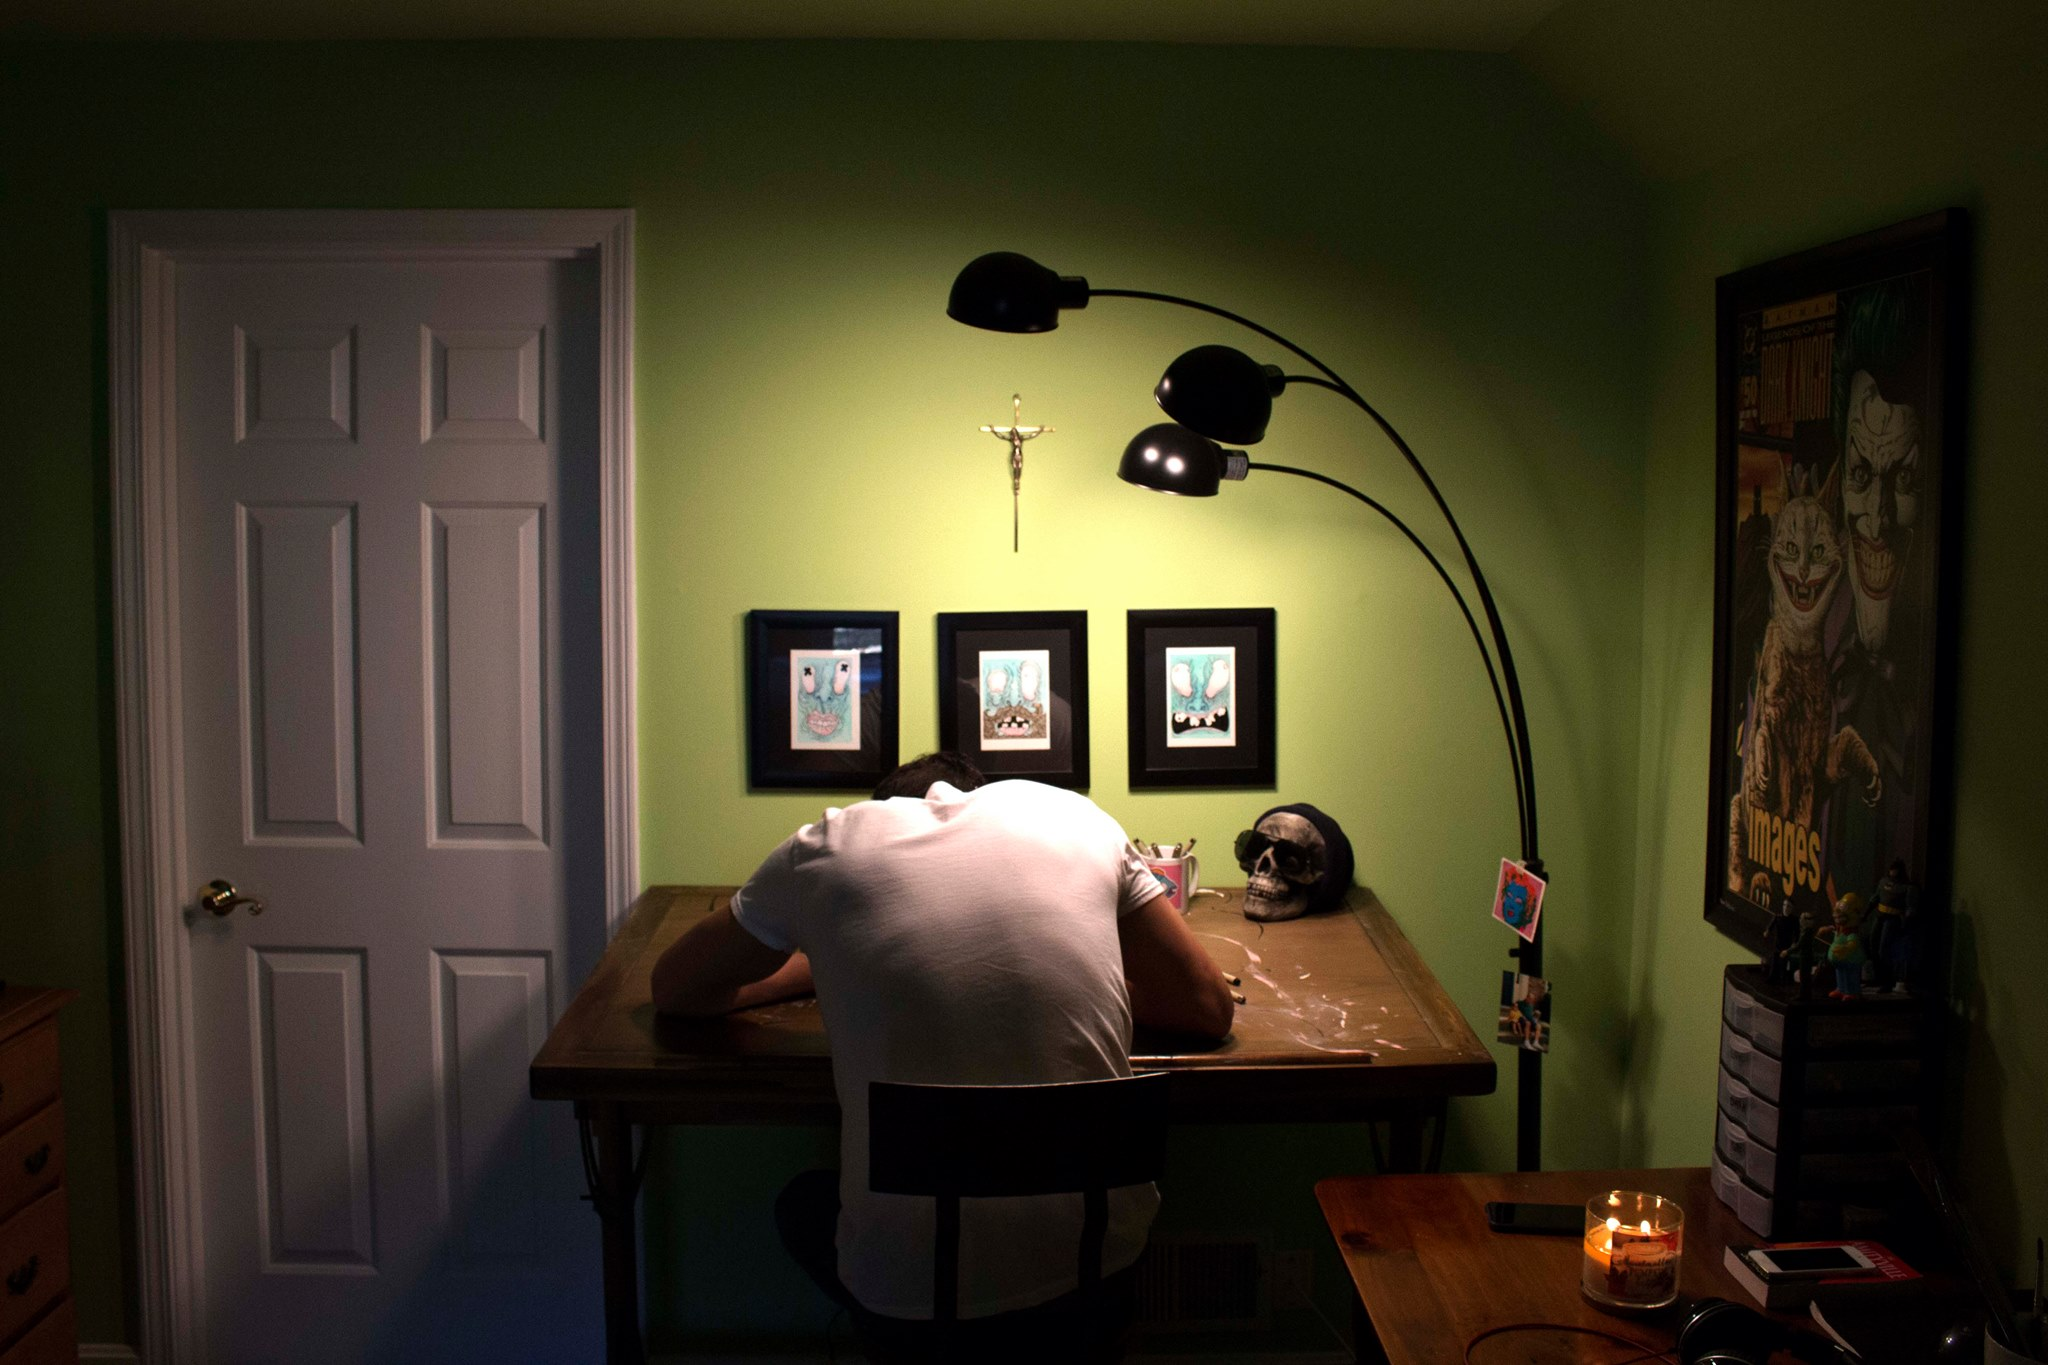 The artist in his studio.